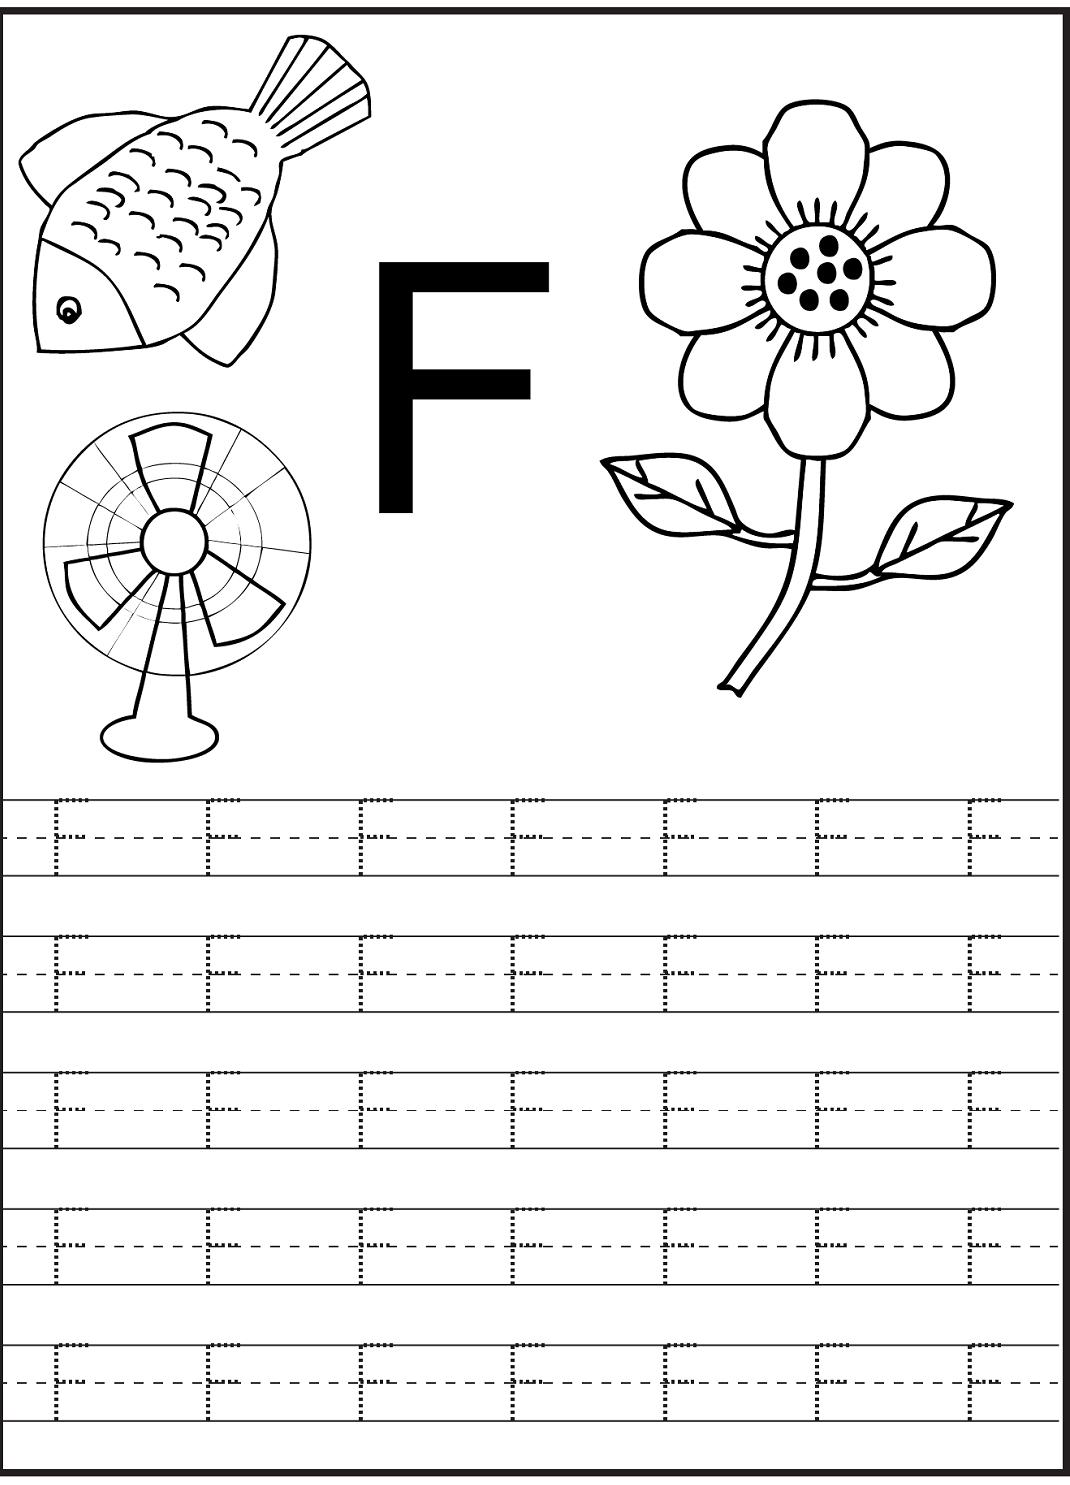 Letter F Worksheets For Preschool Kindergarten Prin Koogra with Letter F Tracing Worksheets Preschool